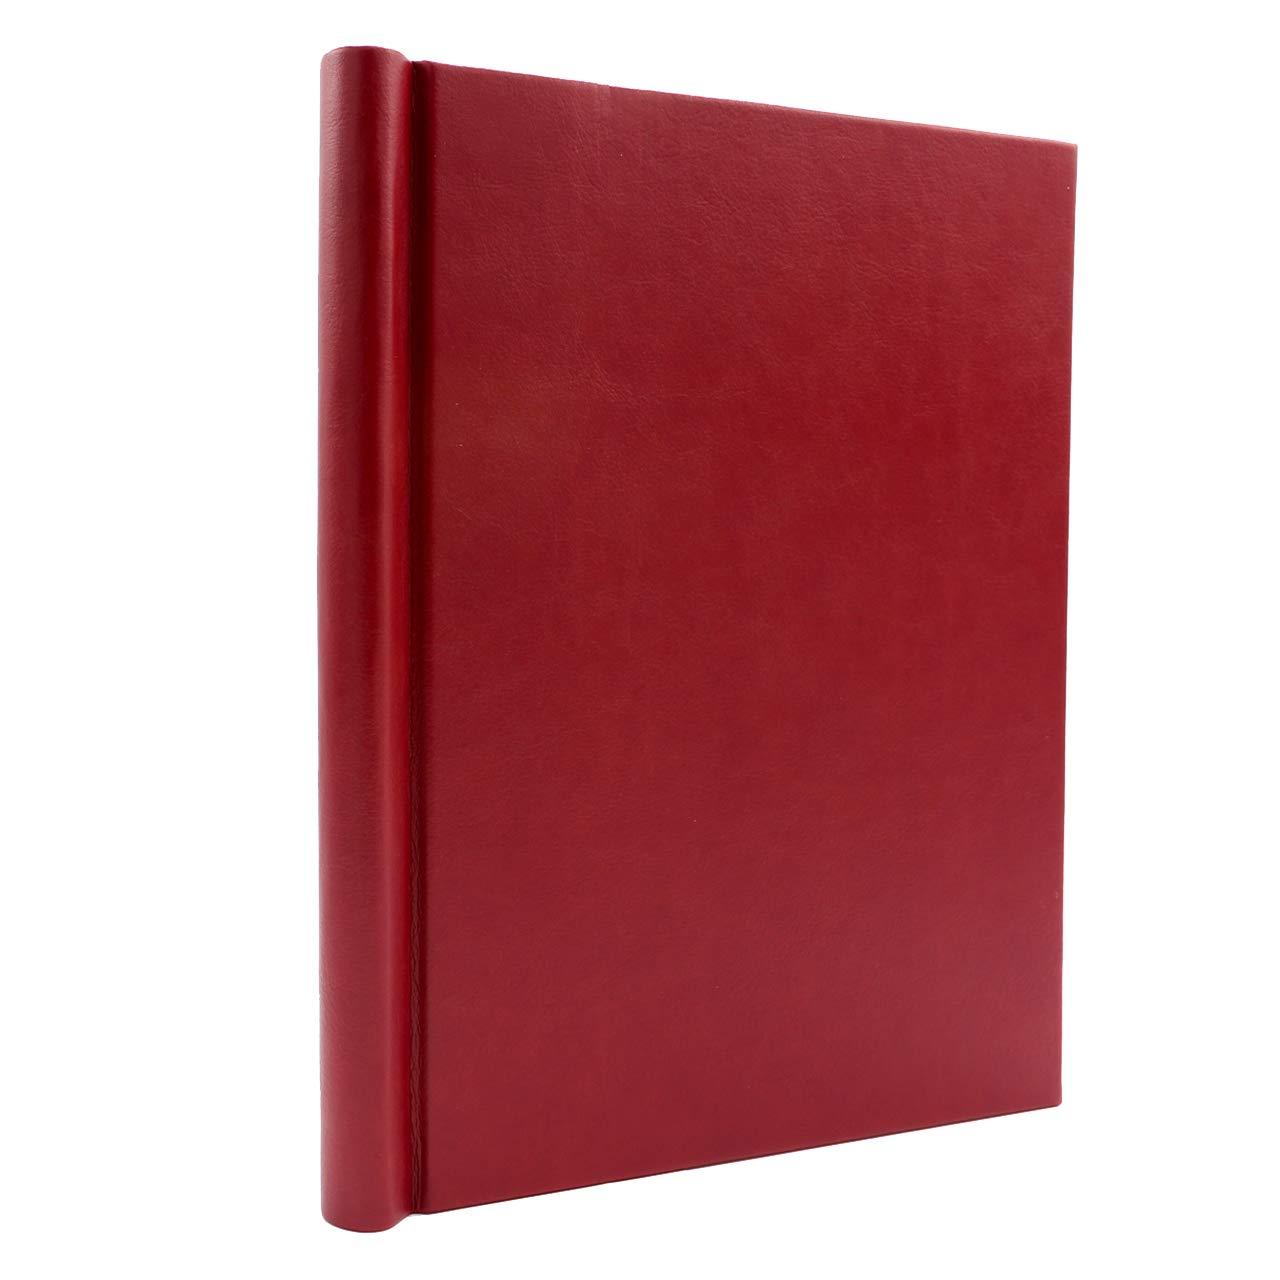 Bindertek 1-Inch Premium Clampback Thesis Binder, Soft Leather Effect, Red (TBXS-L-RD) by Bindertek